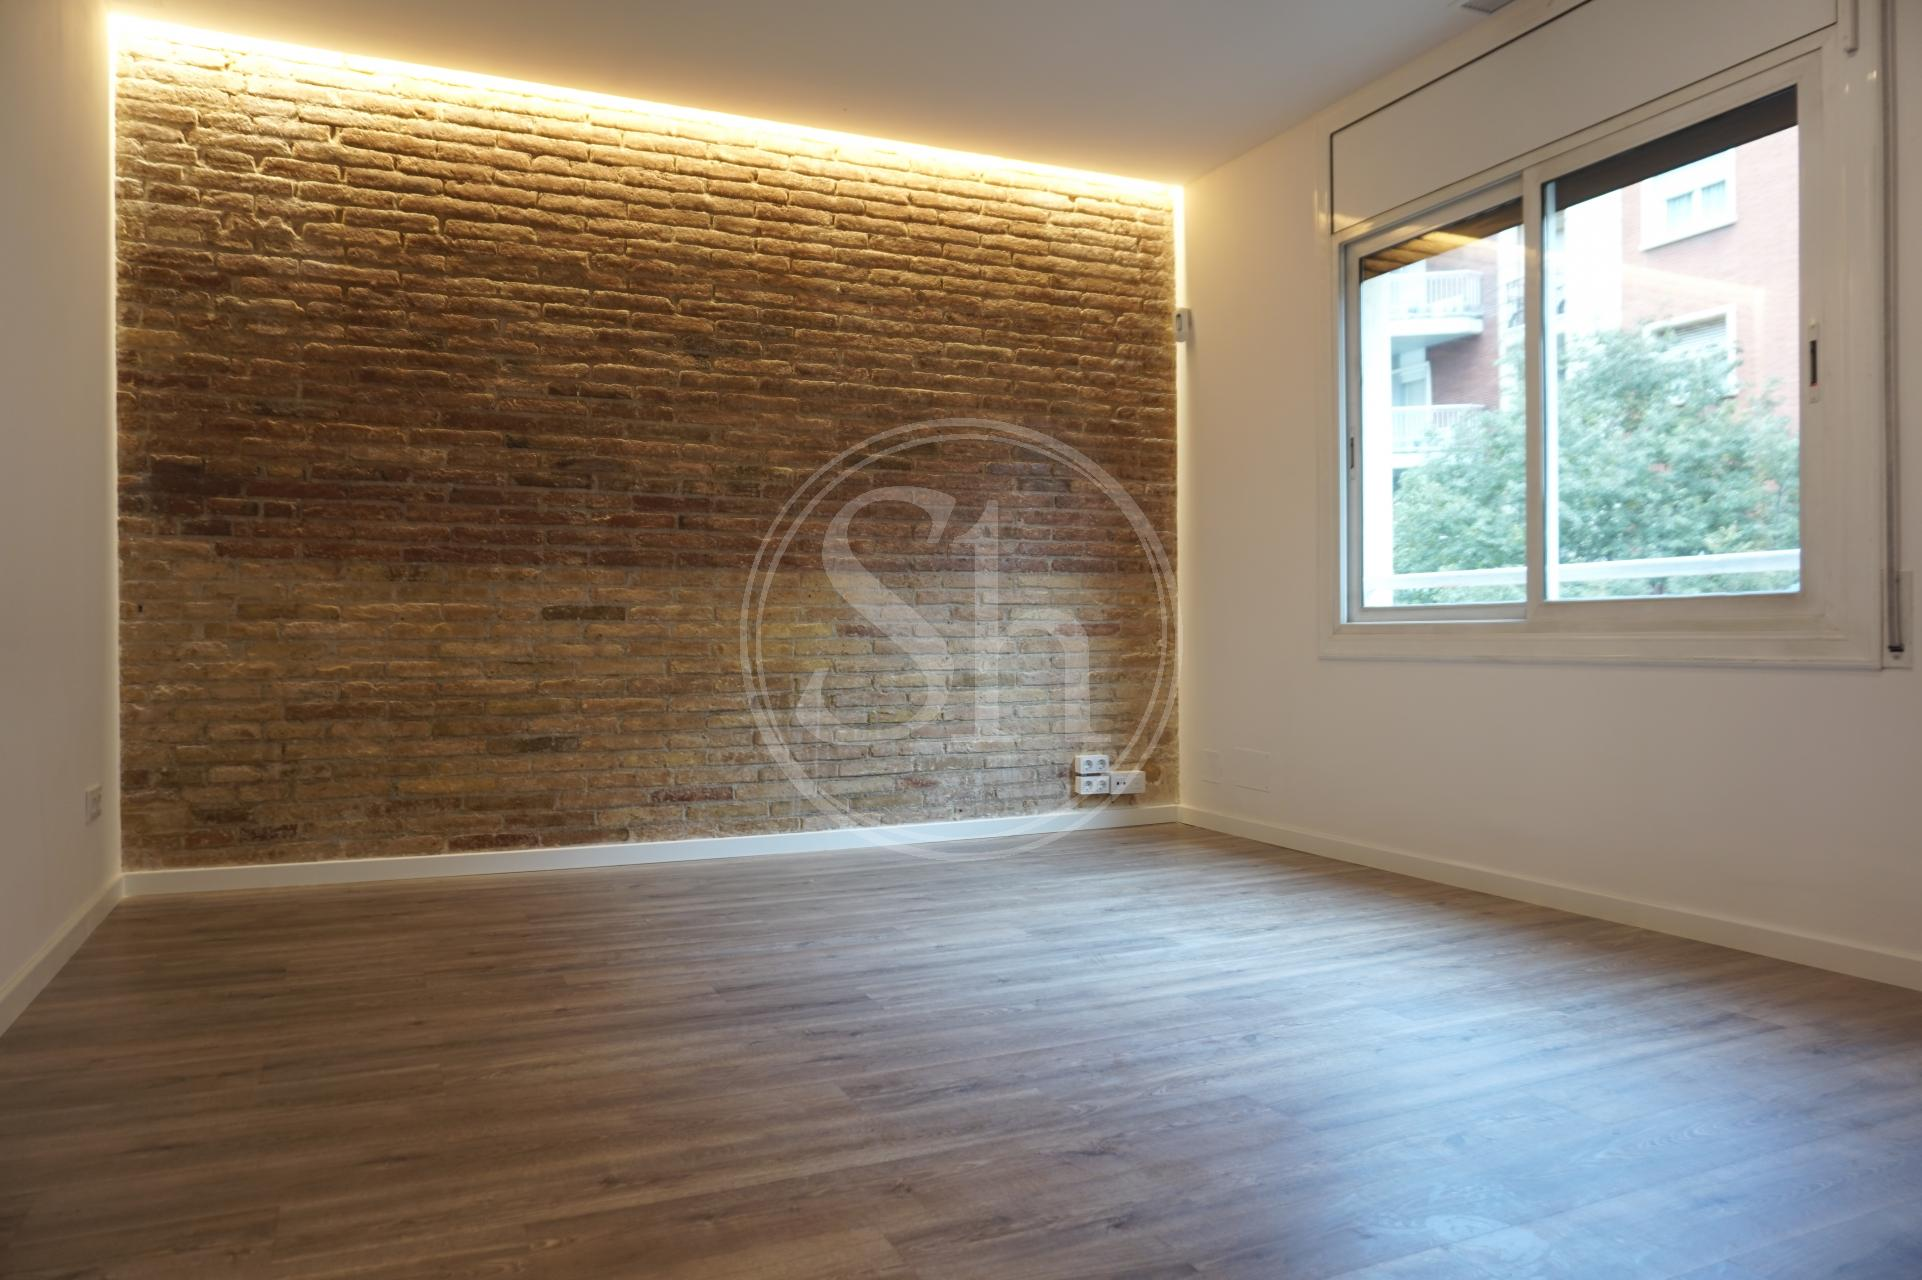 Apartment For Rent In Barcelona Seplveda